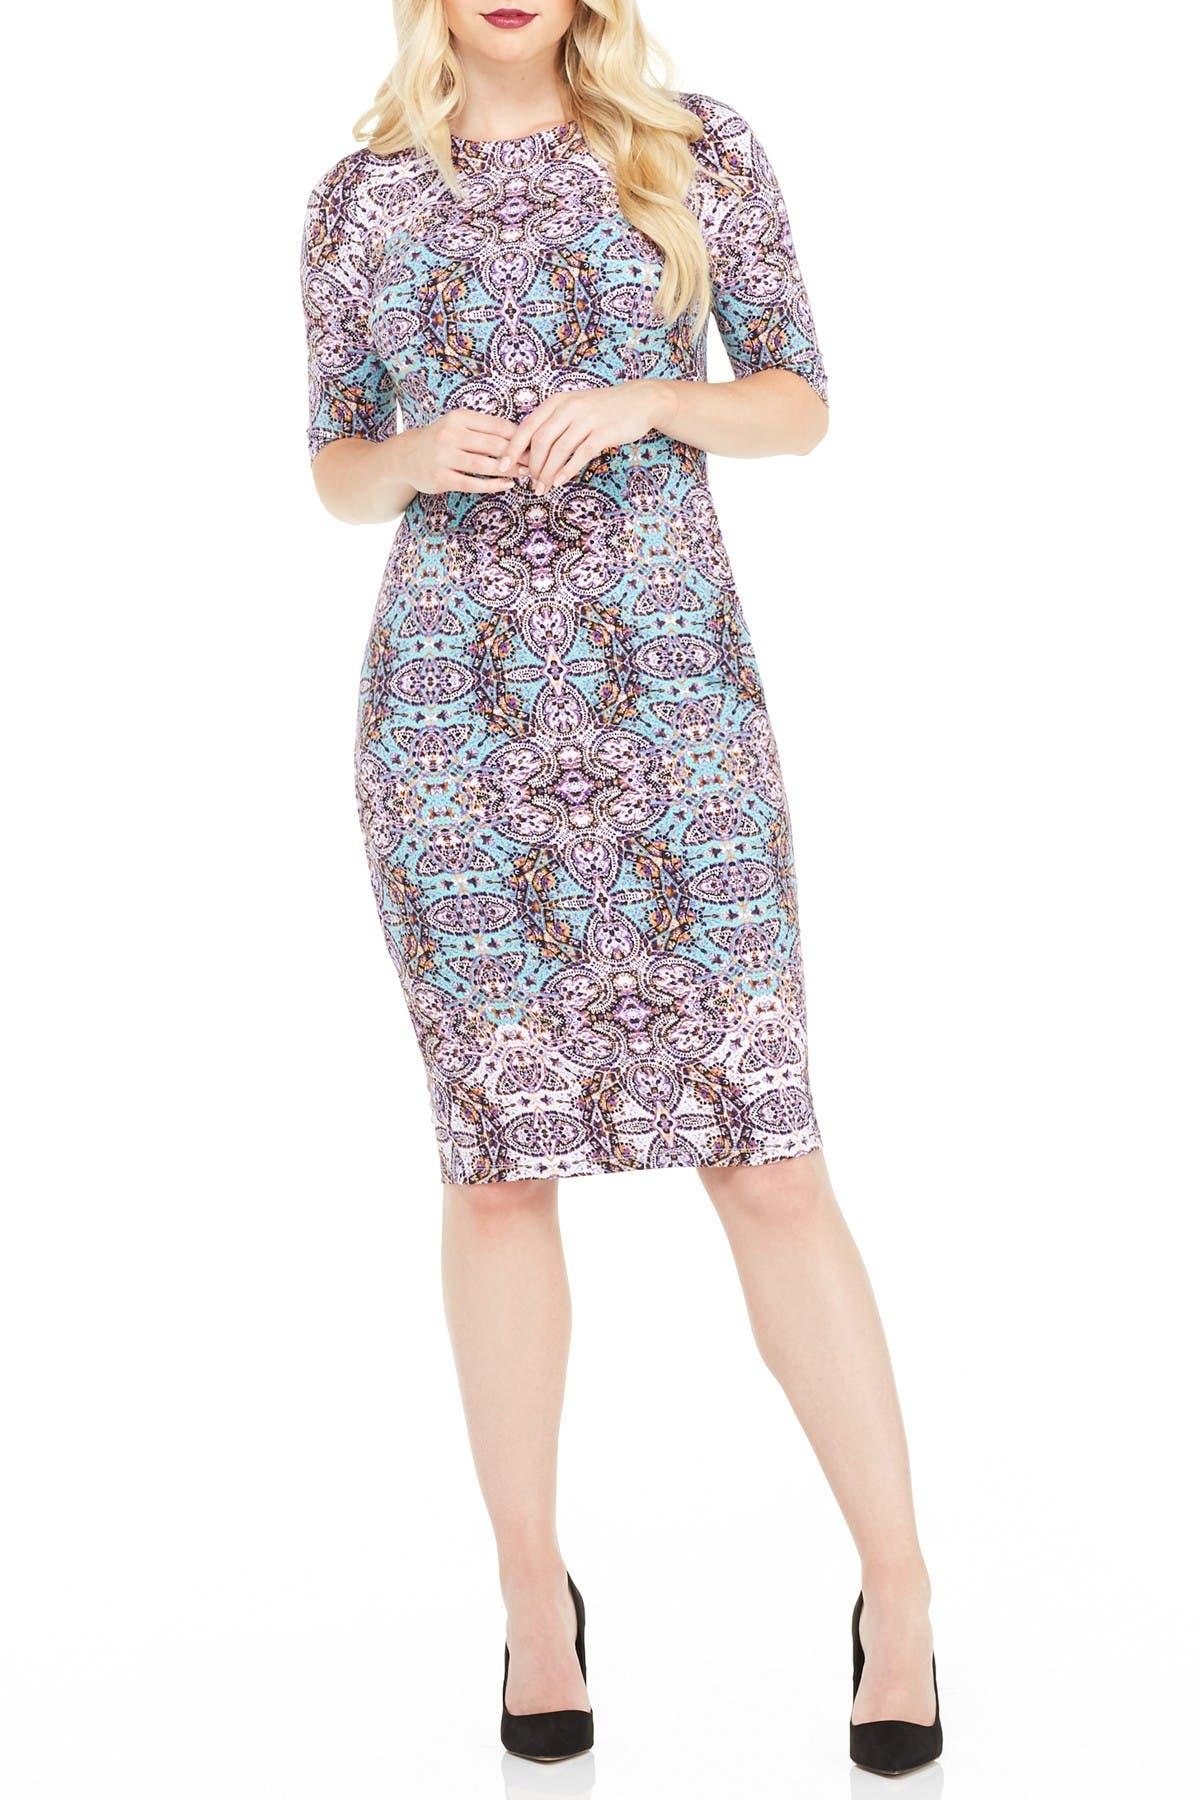 Image of Maggy London Morgan Printed Midi Dress